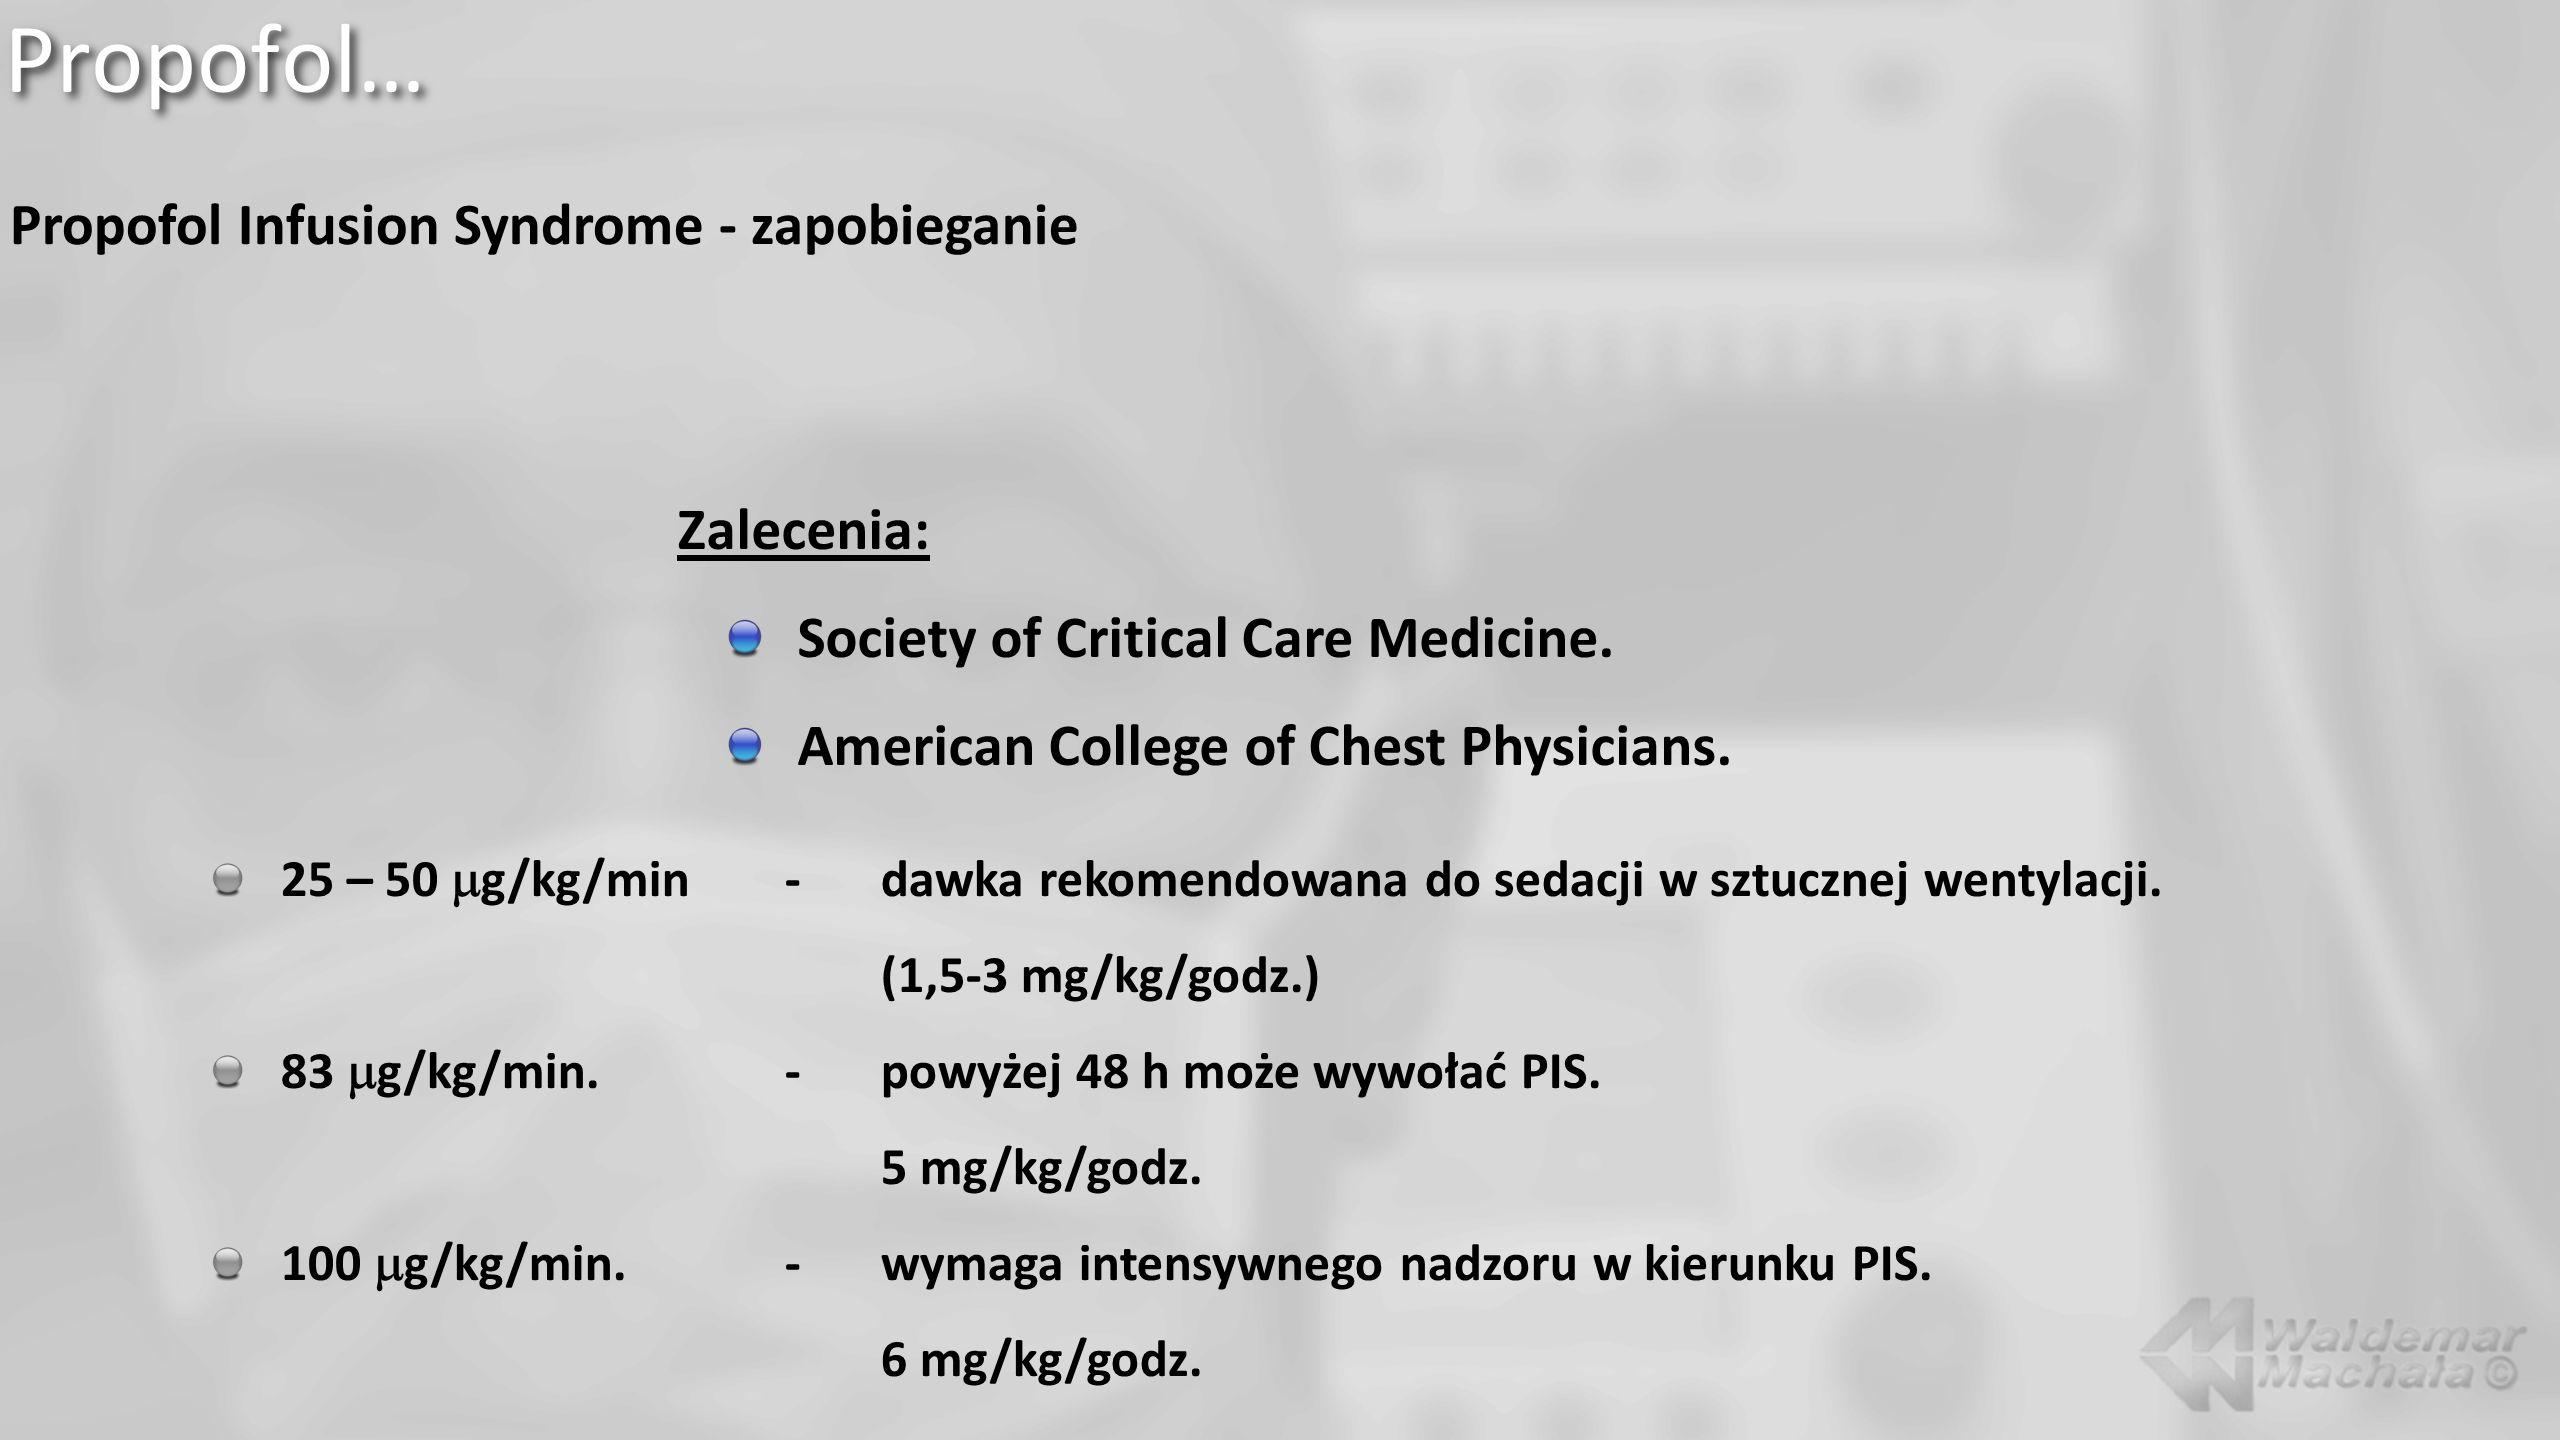 Propofol… Propofol Infusion Syndrome - zapobieganie Zalecenia: Society of Critical Care Medicine. American College of Chest Physicians. 25 – 50 g/kg/m